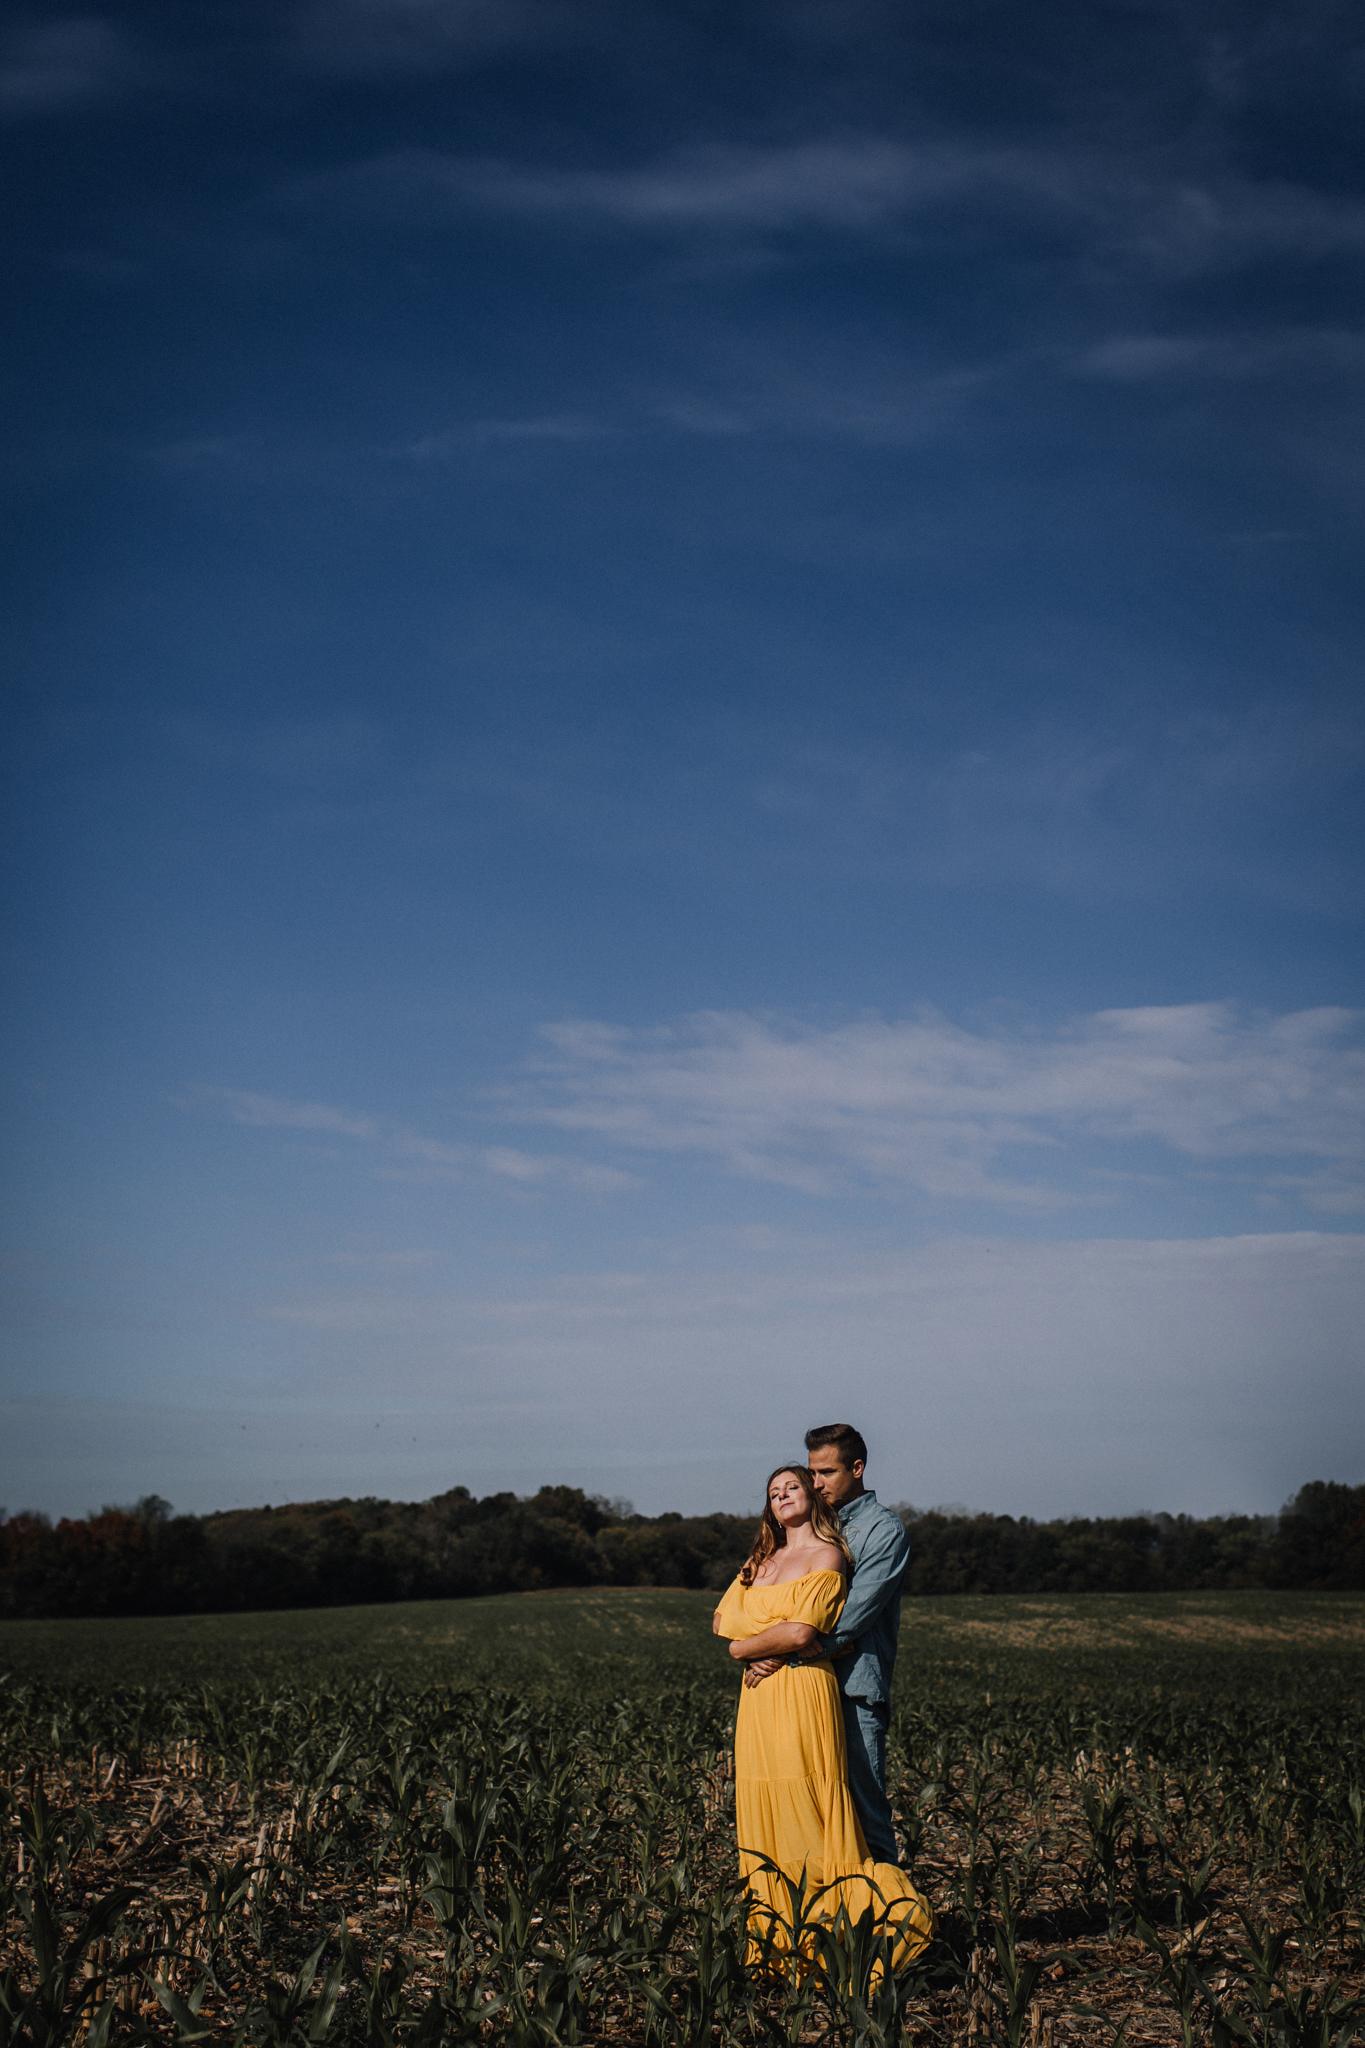 billie-shaye-style-photography-www.billieshayestyle.com-harsh-light-couples-session-nashville-tennessee-7464.jpg